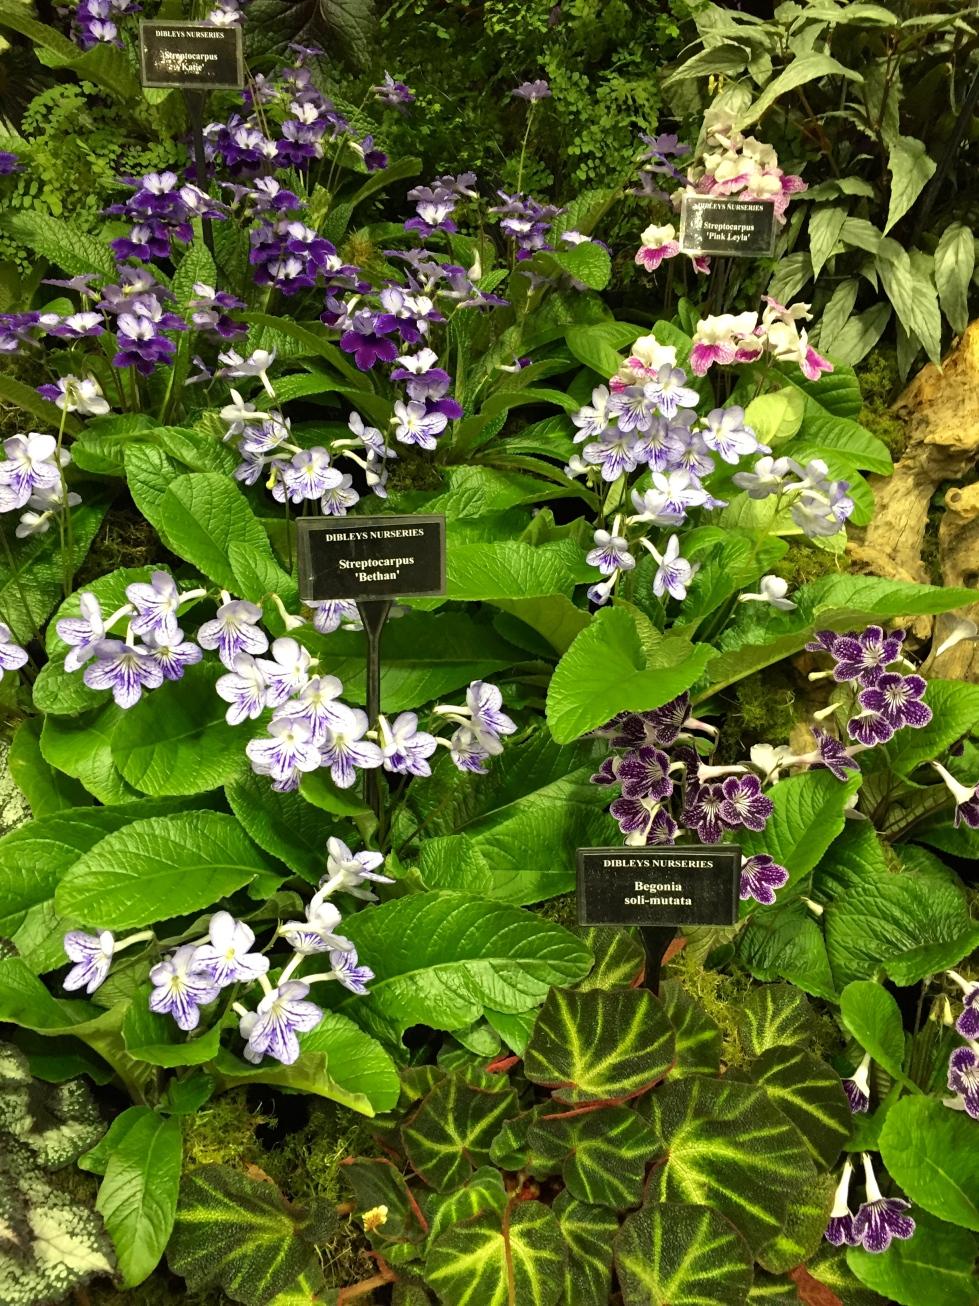 Dibley's display of streptocarpus and begonias